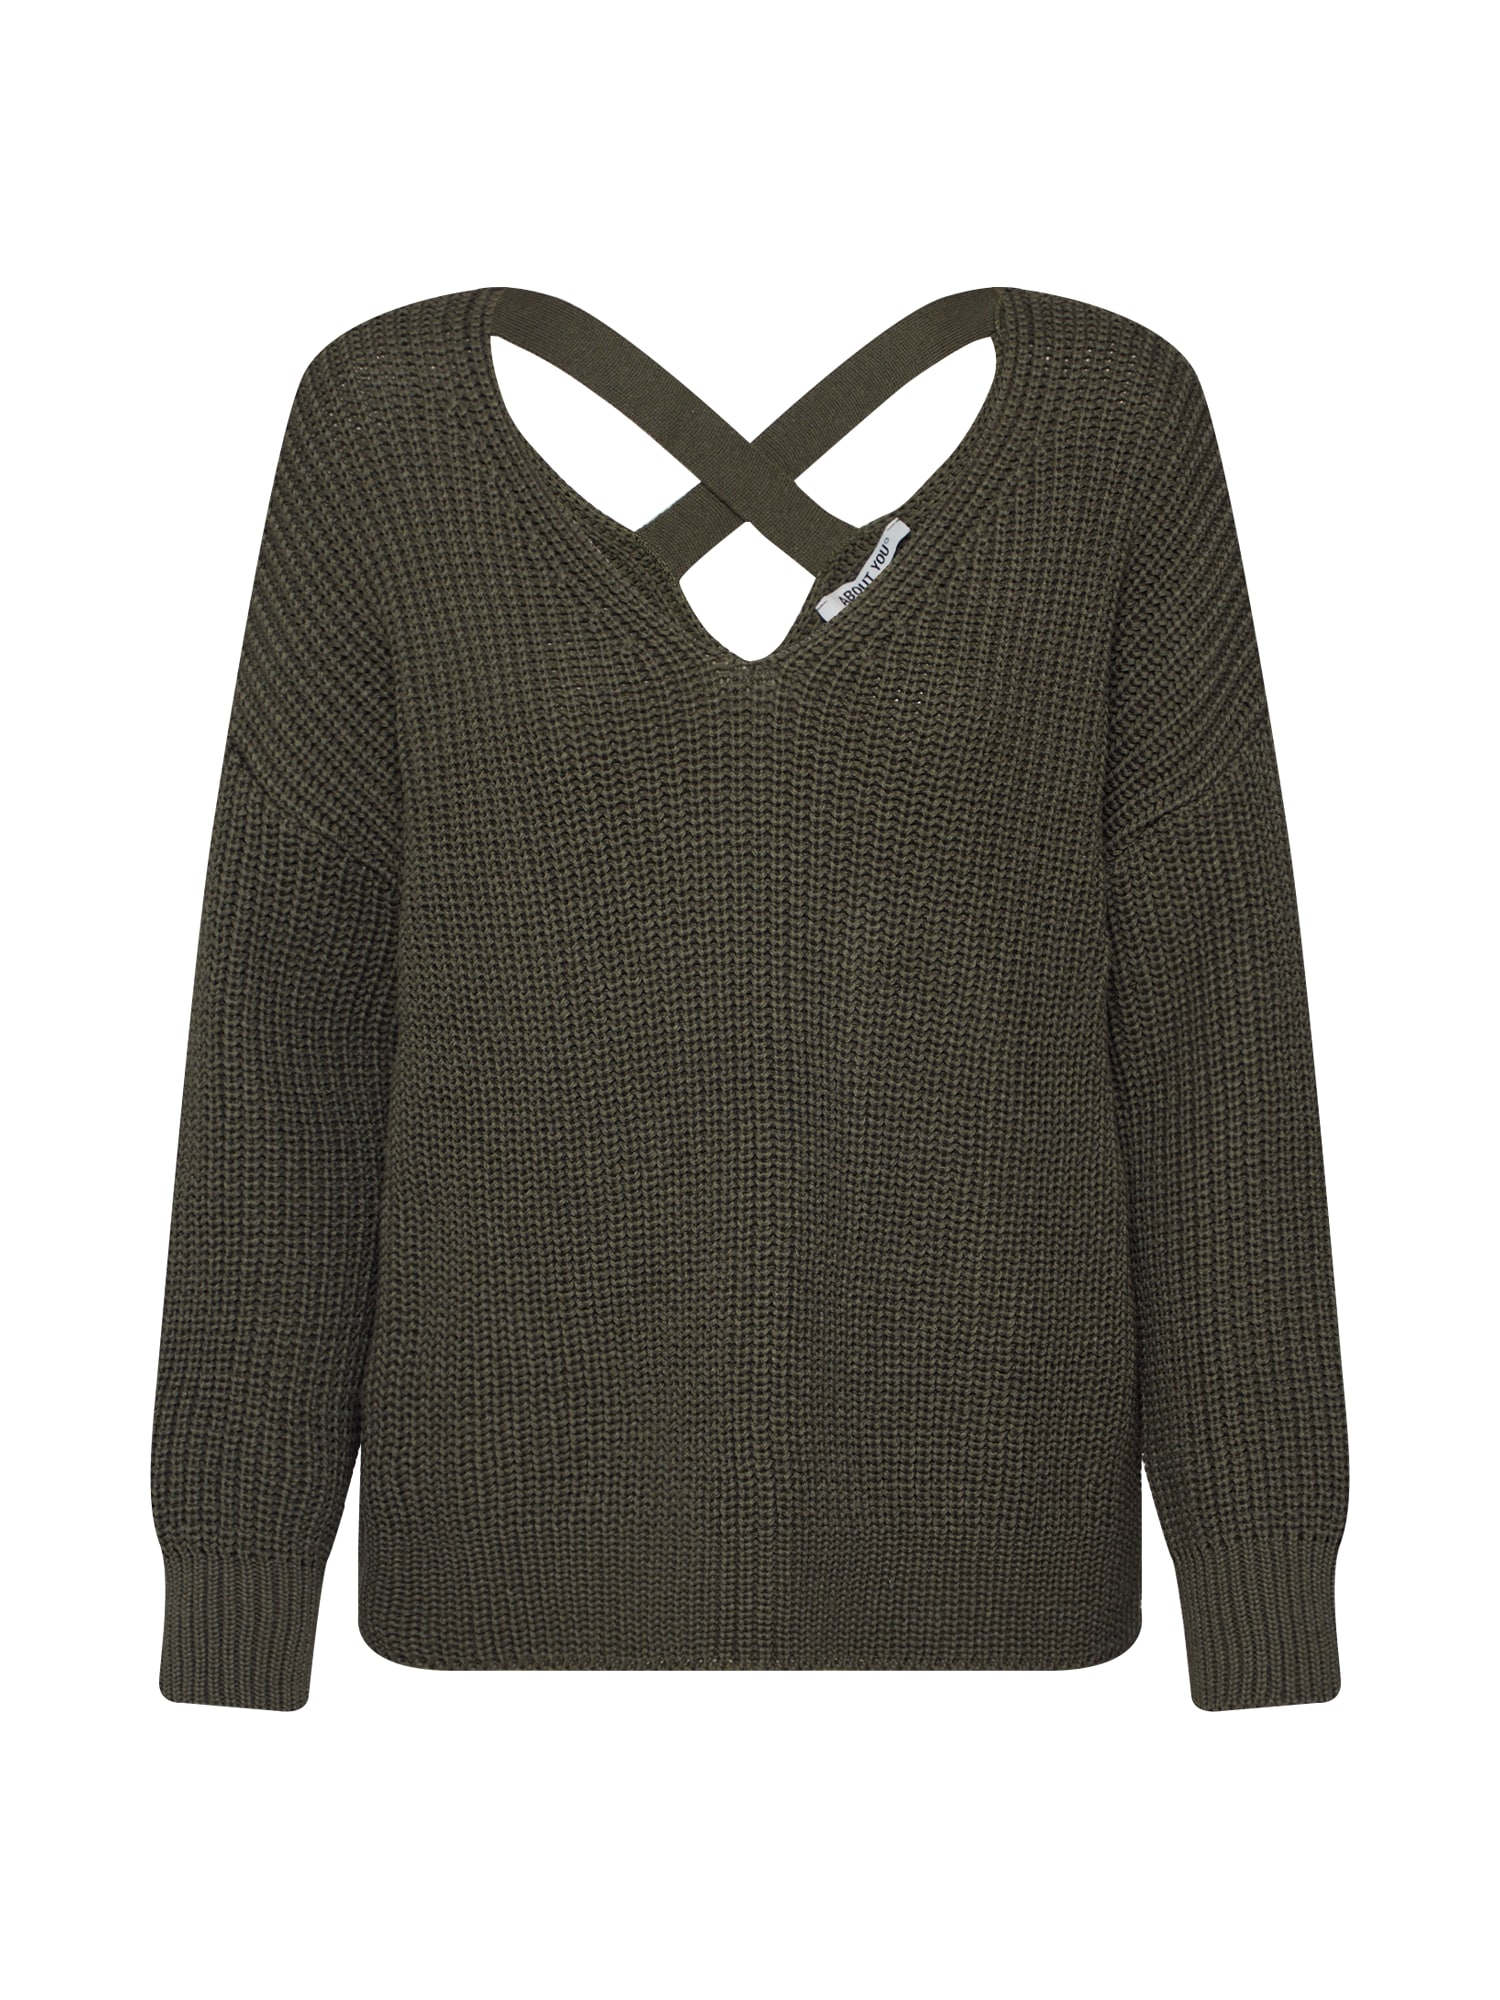 ABOUT YOU Megztinis 'Liliana' tamsiai žalia